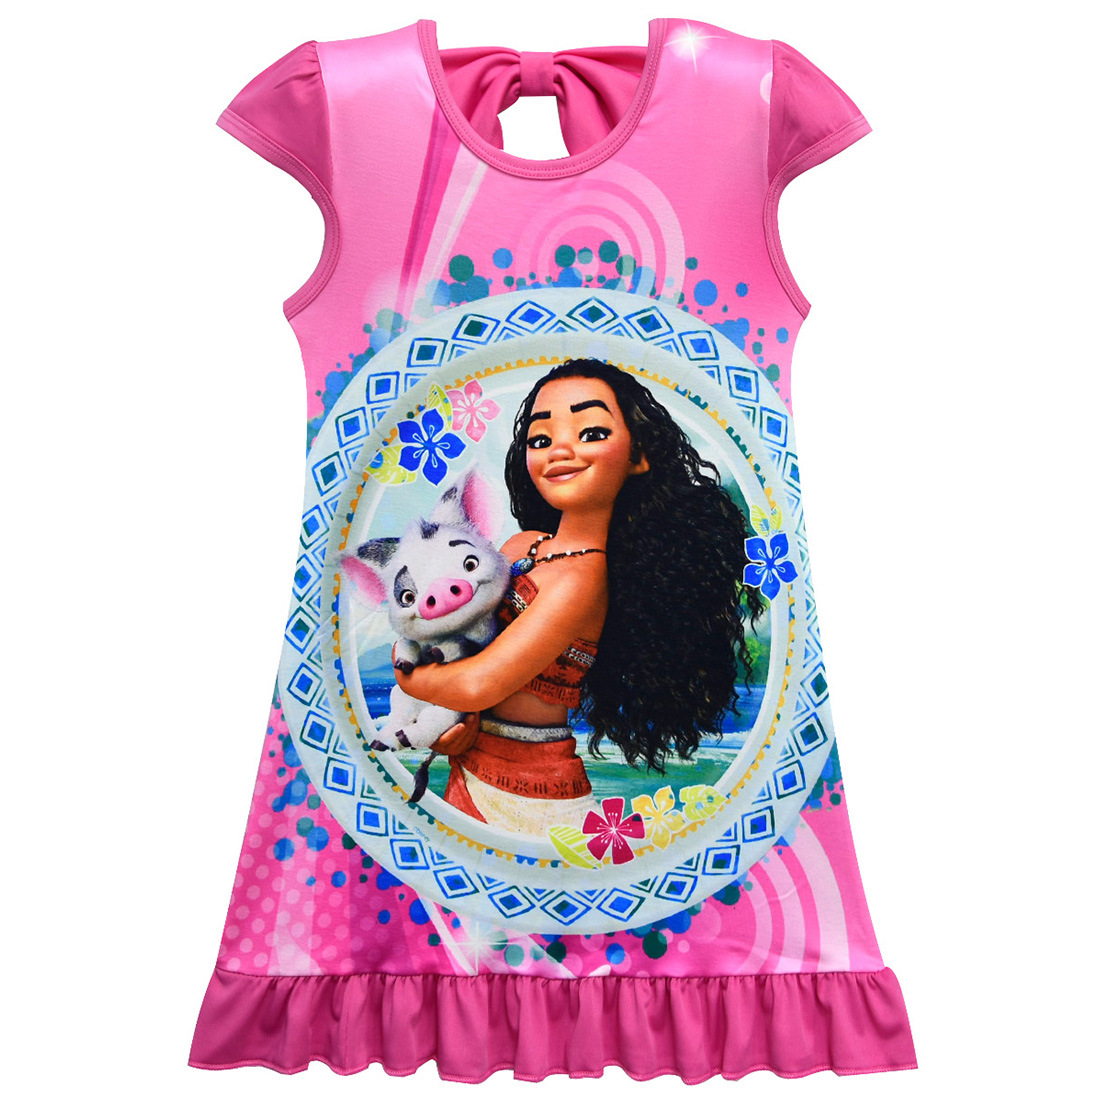 Moana Girls Kids Summer Fashion Nightdress Cosplay Halloween Party Loose Dress Ebay